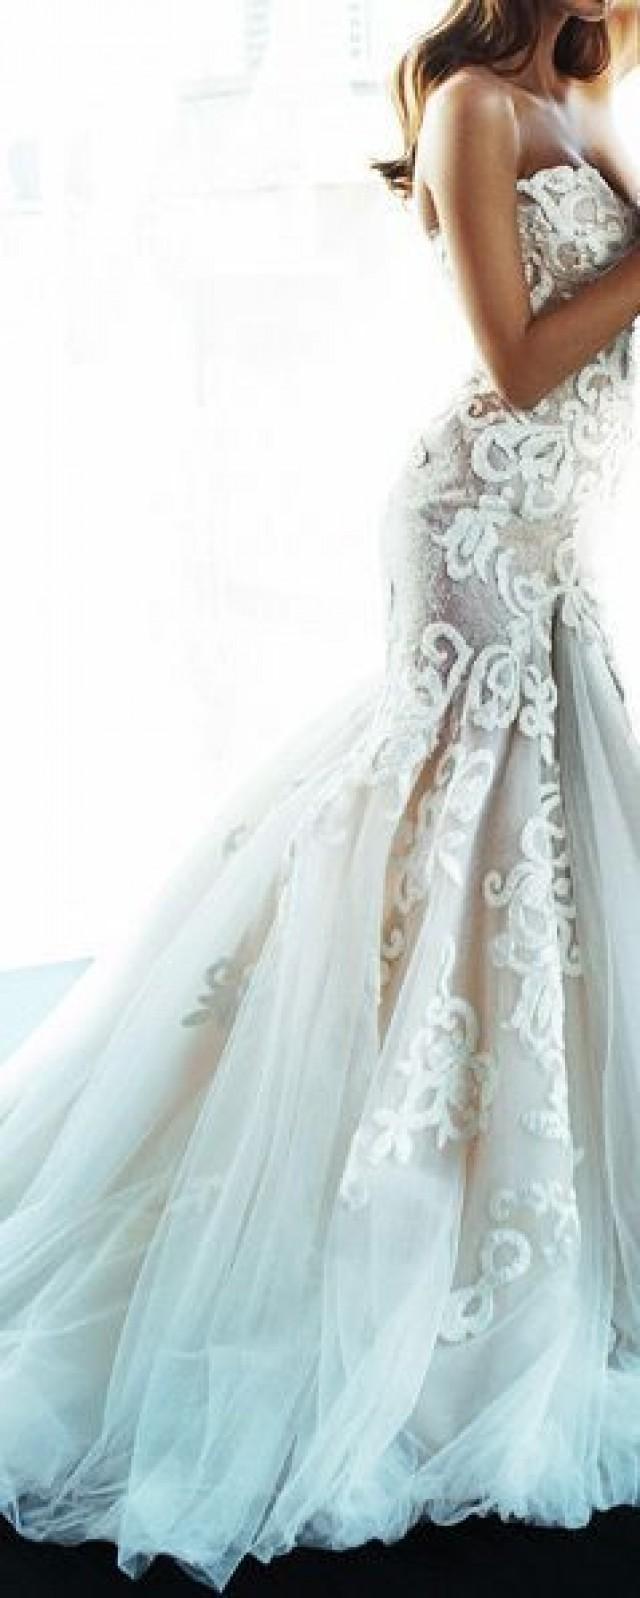 Wedding Dresses - Unique Wedding Dress. #2068710 - Weddbook